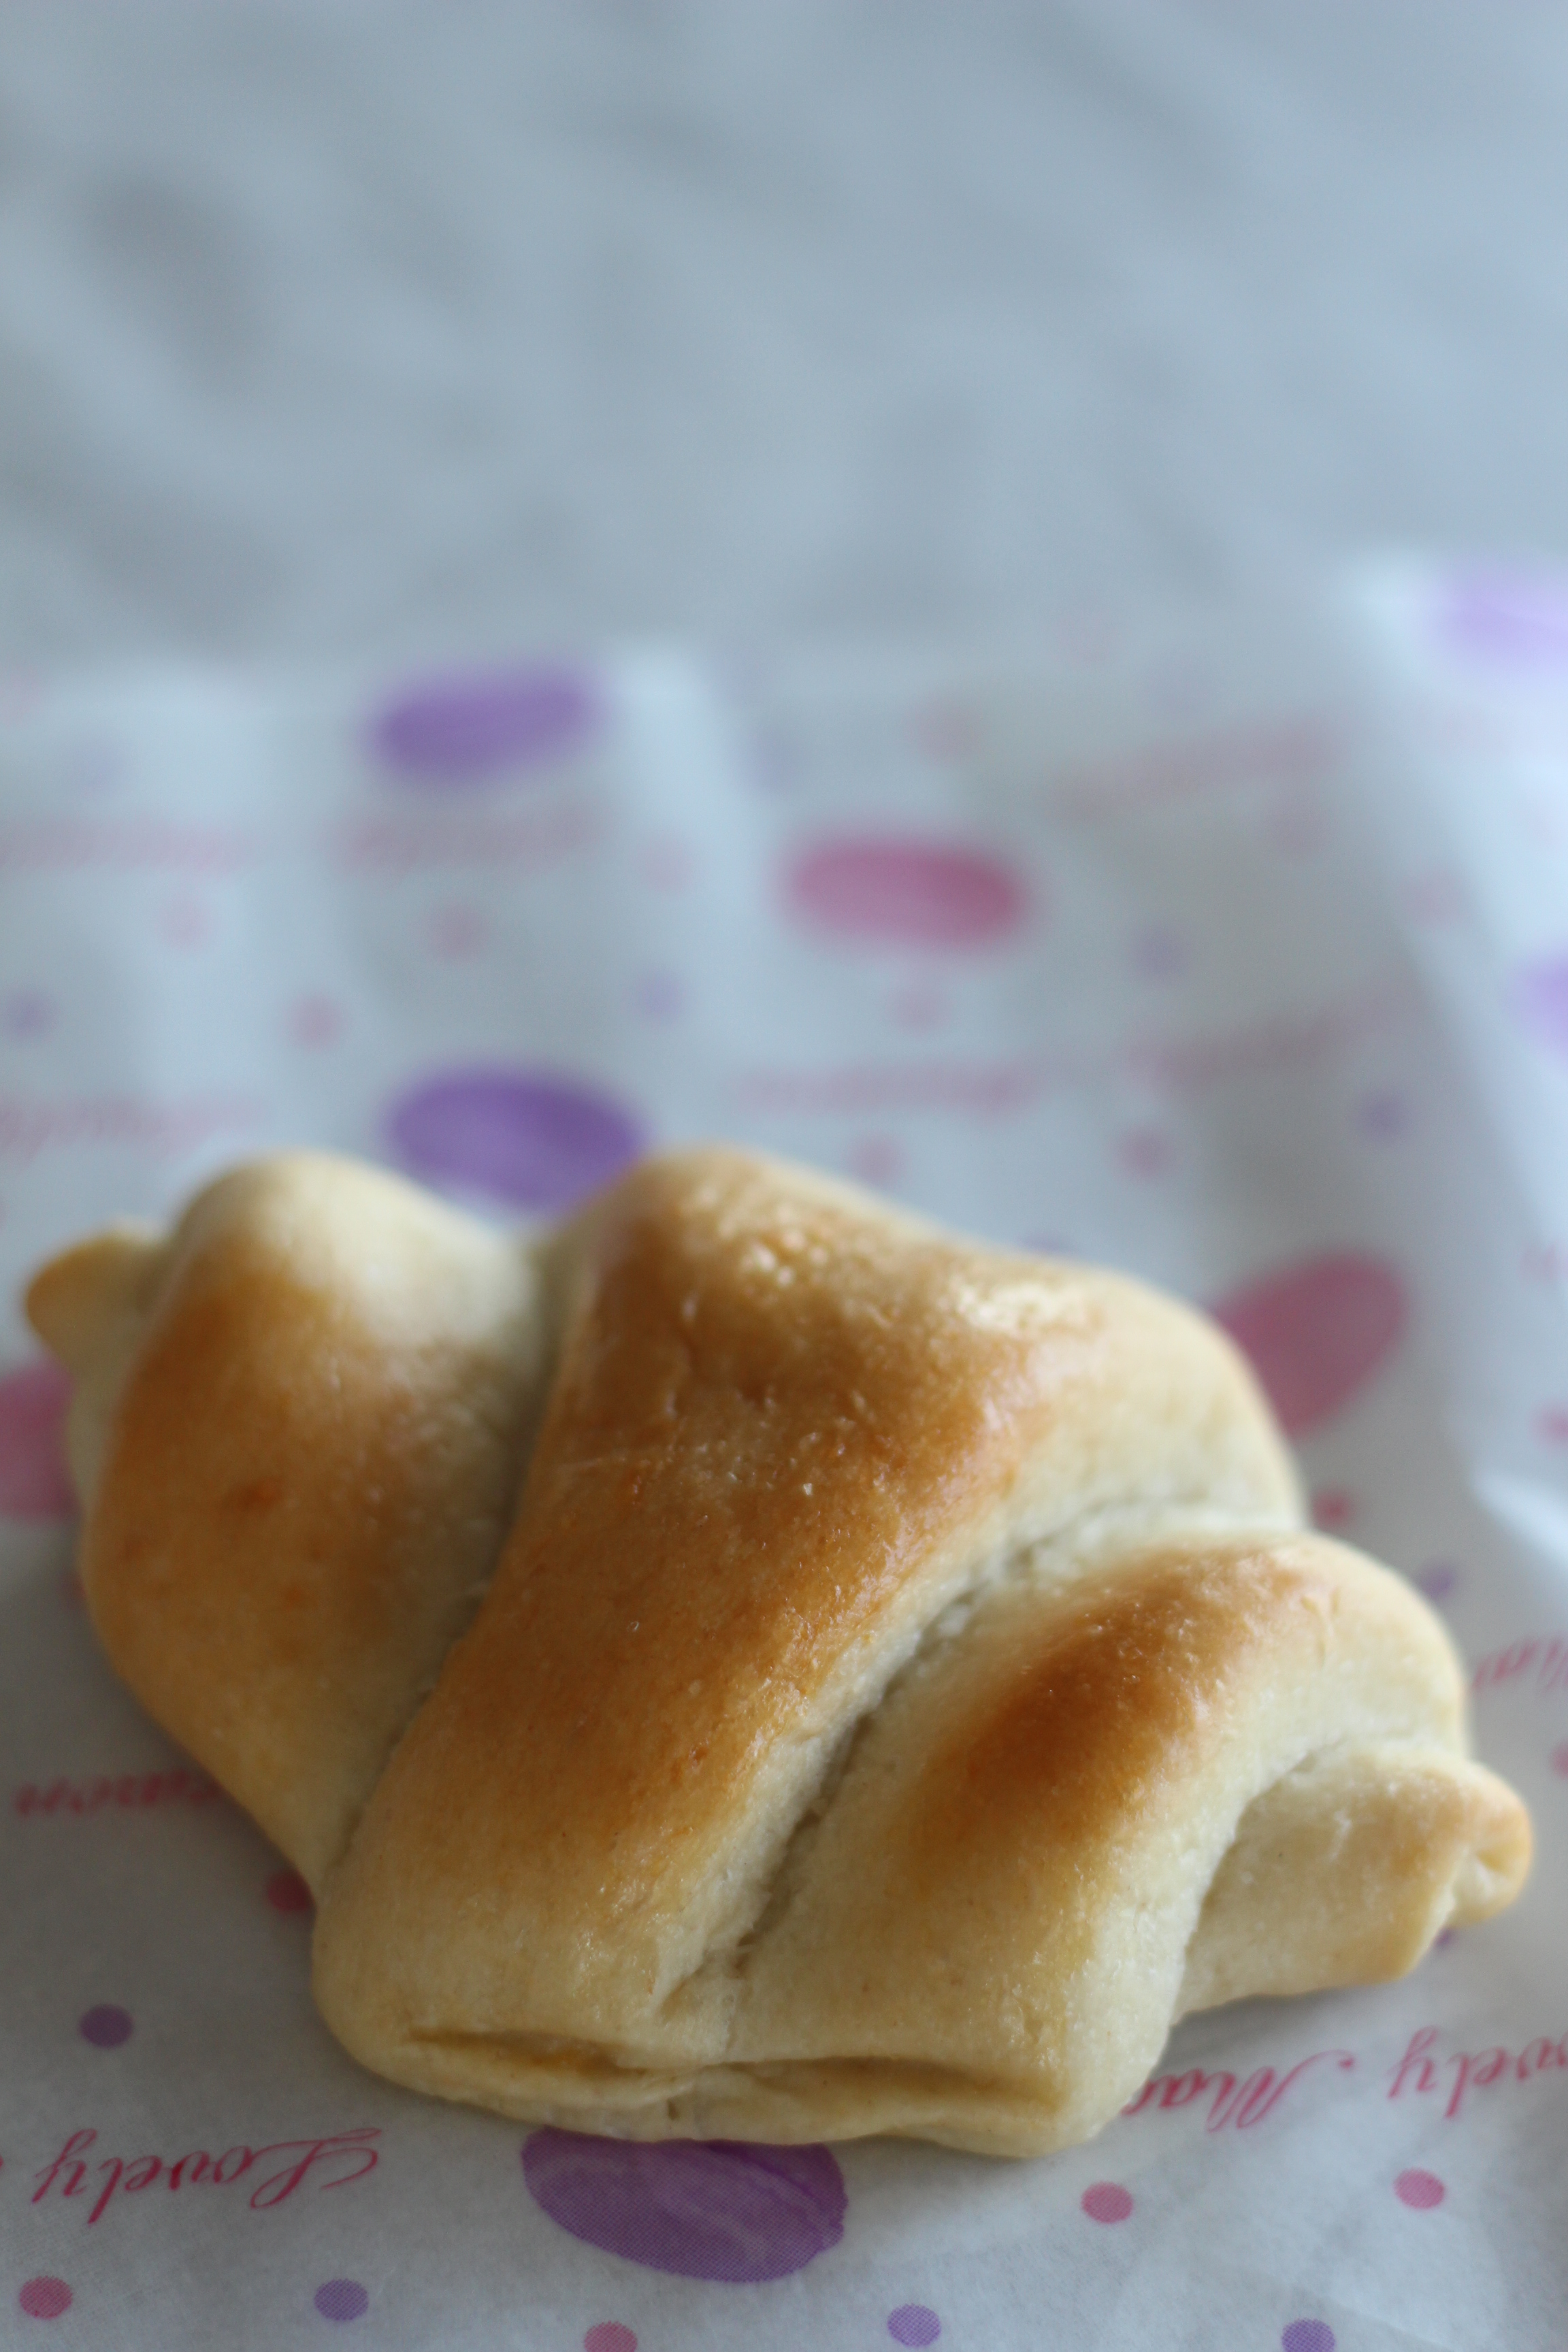 a-ta-sante糖質制限パン料理教室。阿倍野西田辺。京都江部粉糖質制限パンベーシックコース。